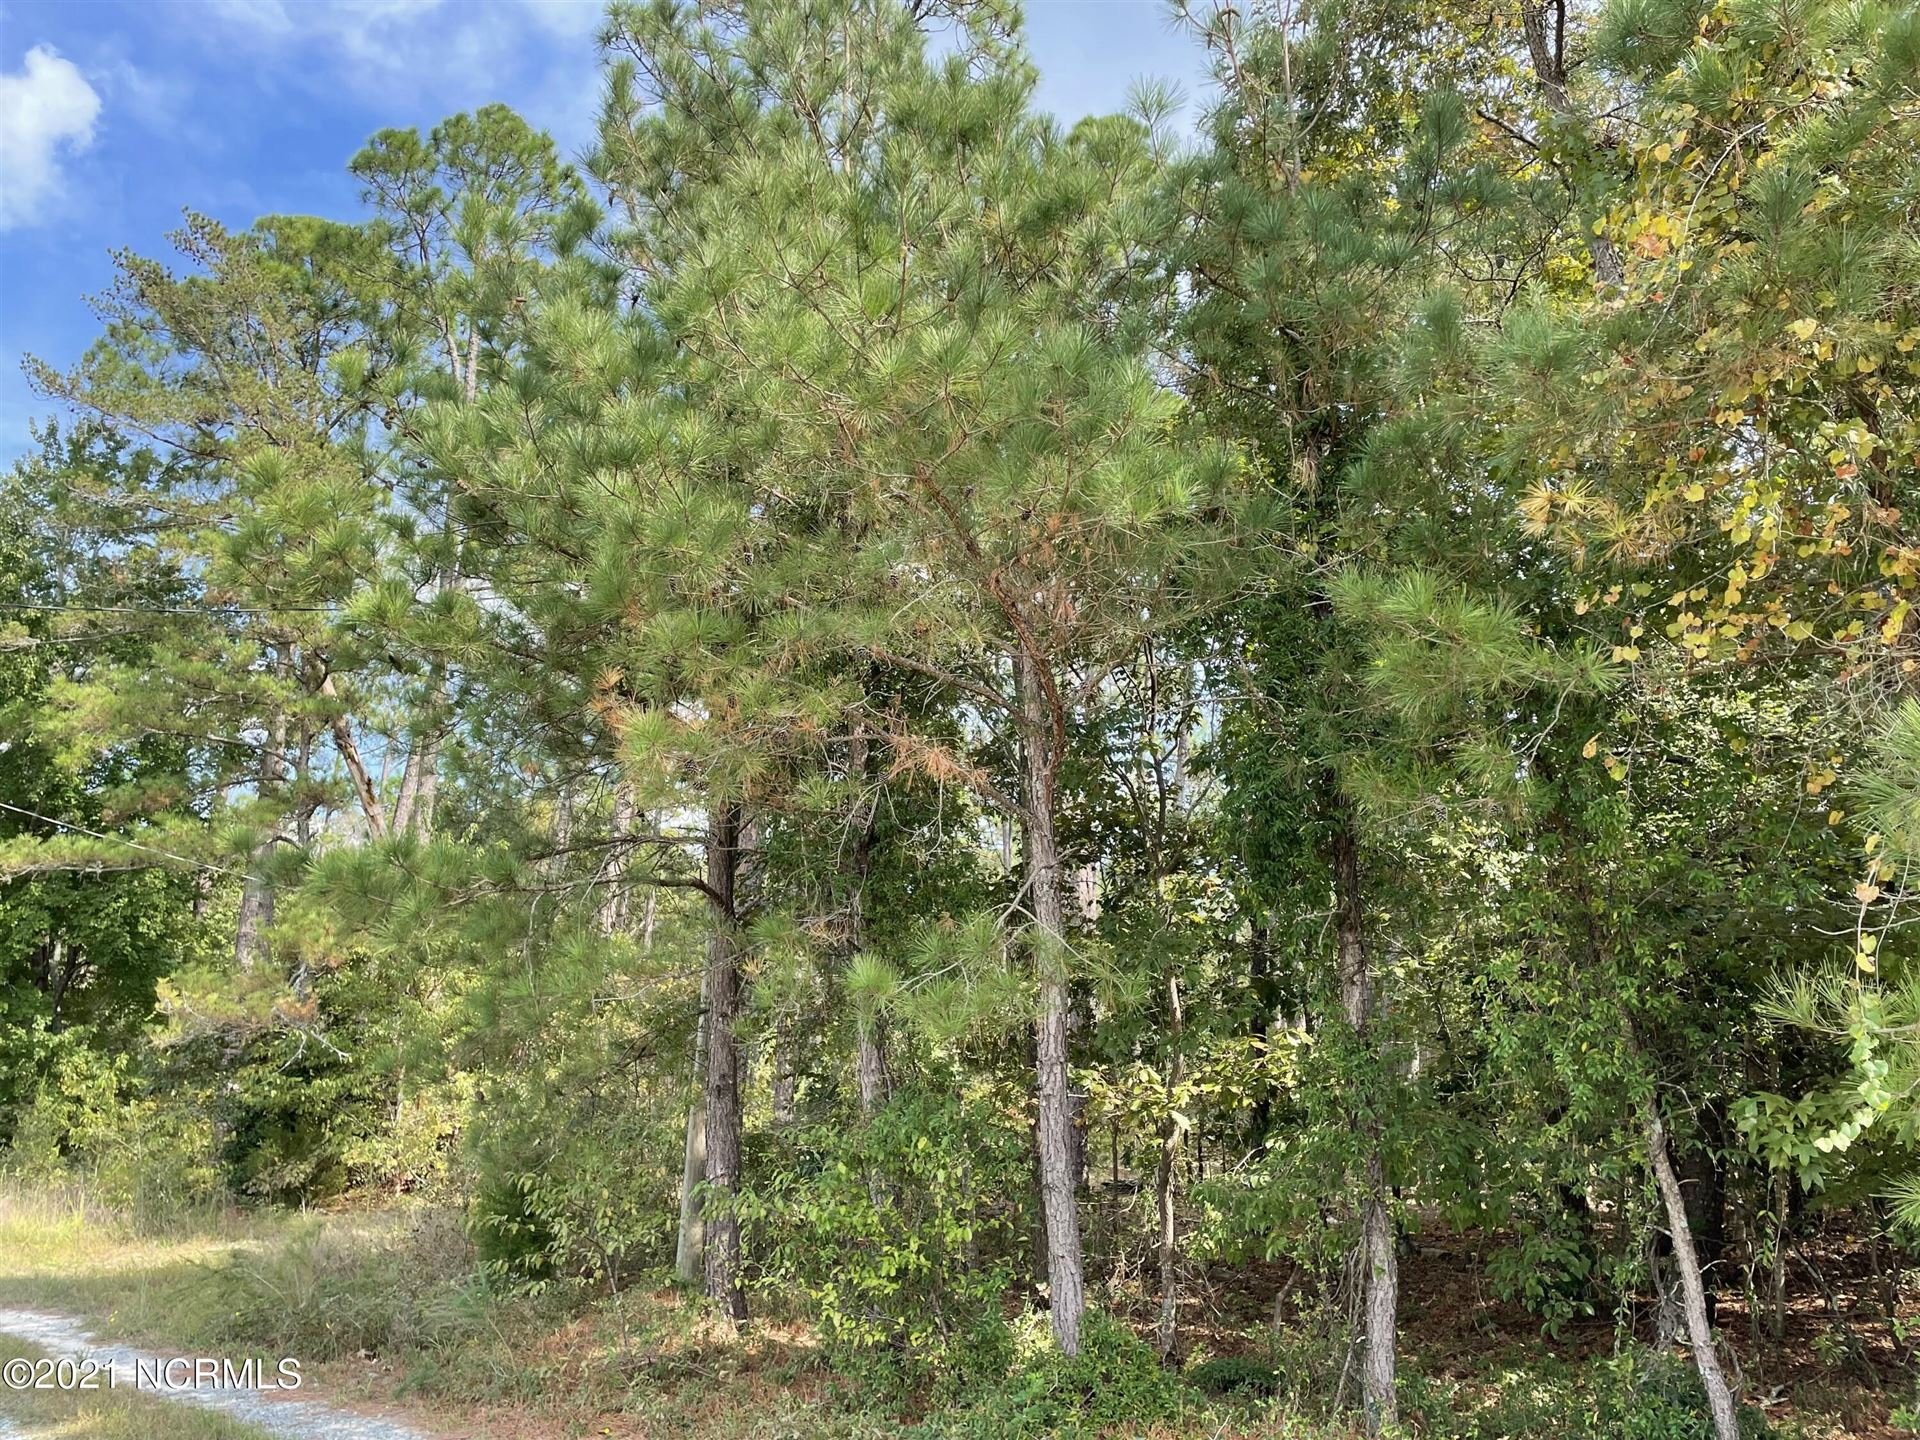 Photo of 312 Lamms Grove Rd Ext Ext, Cameron, NC 28326 (MLS # 100296533)